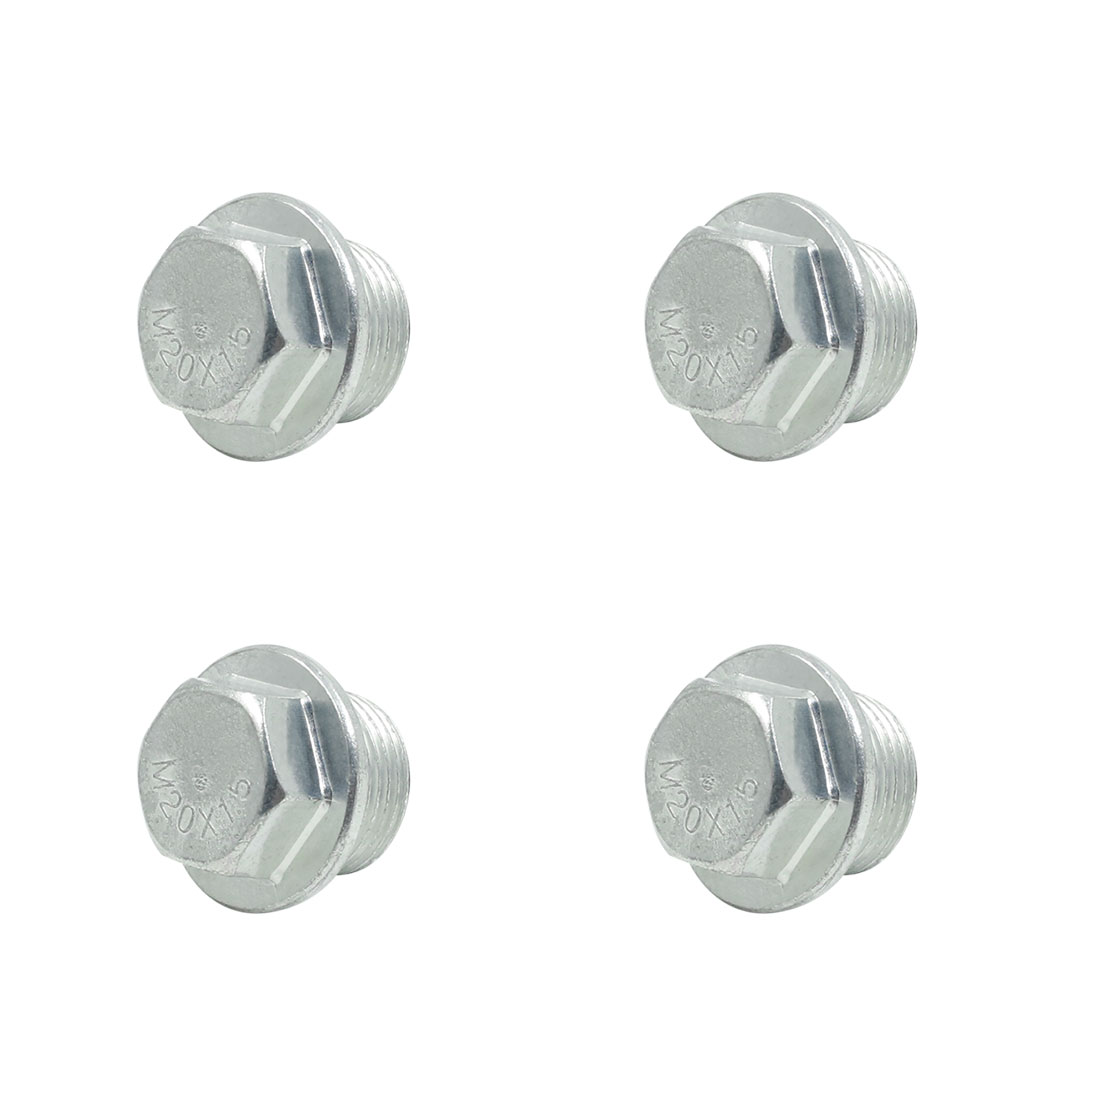 4pcs 28 x 23mm Auto Car Silver Tone Magnetic Engine Oil Pan Drain Plug Bolt